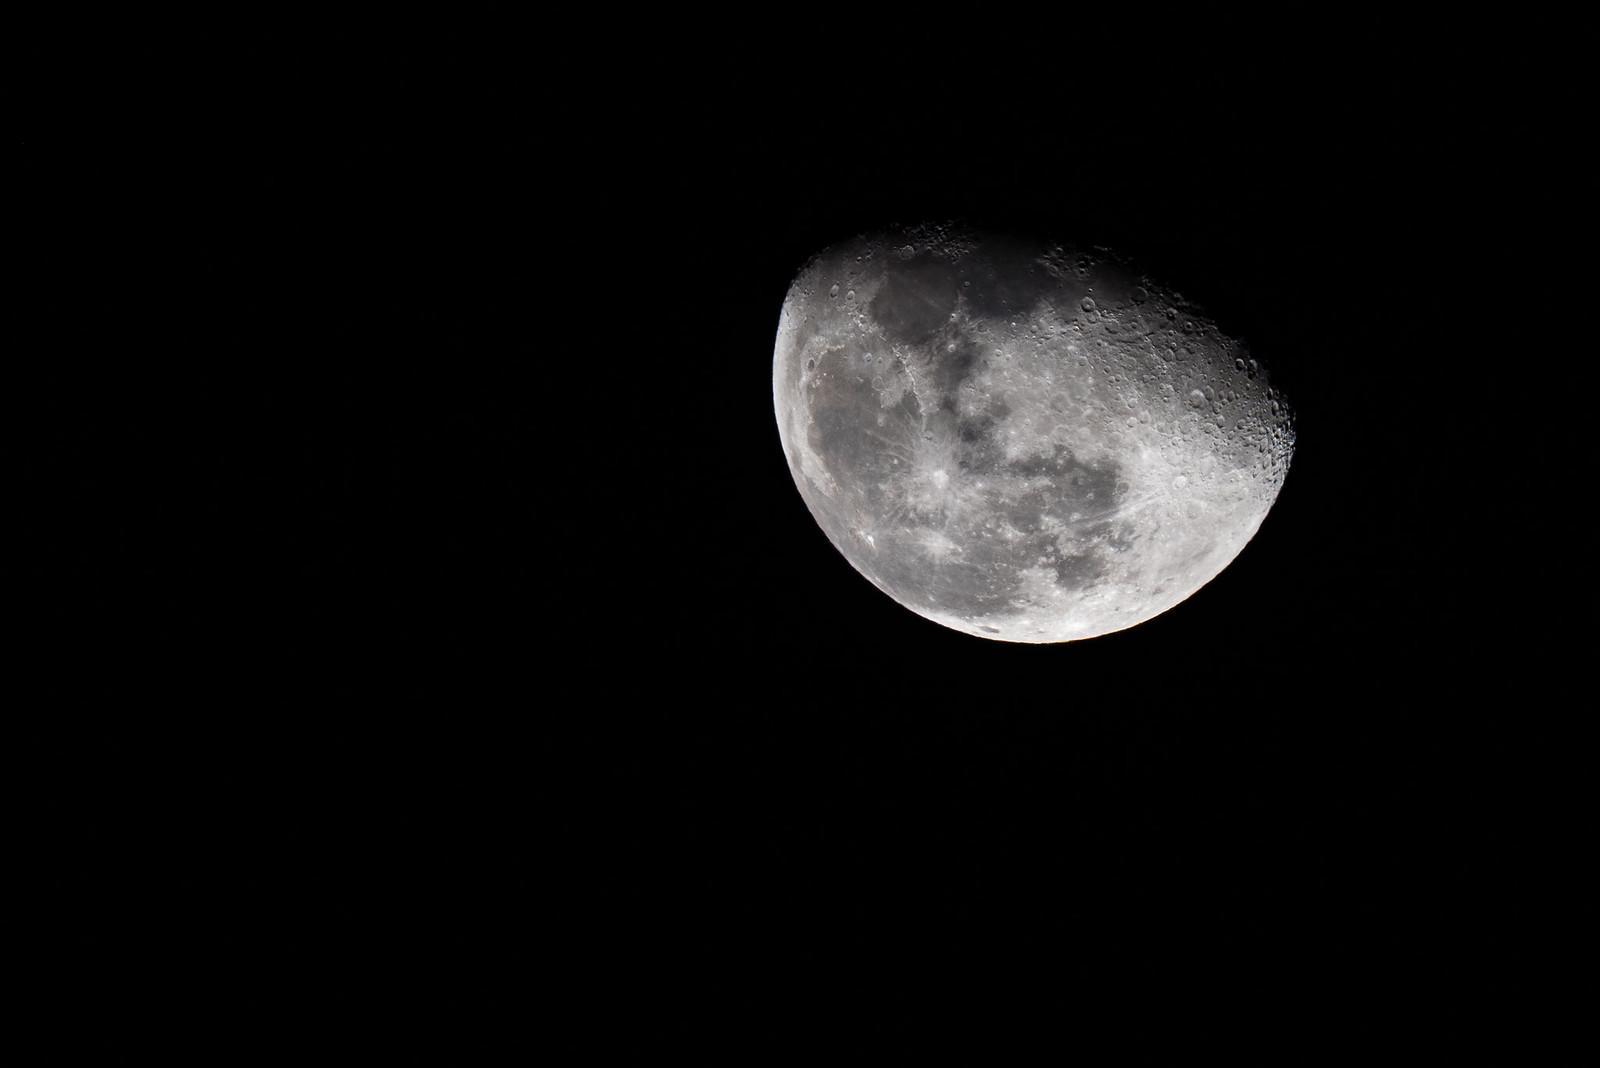 Moon: Waning gibbous (82%)